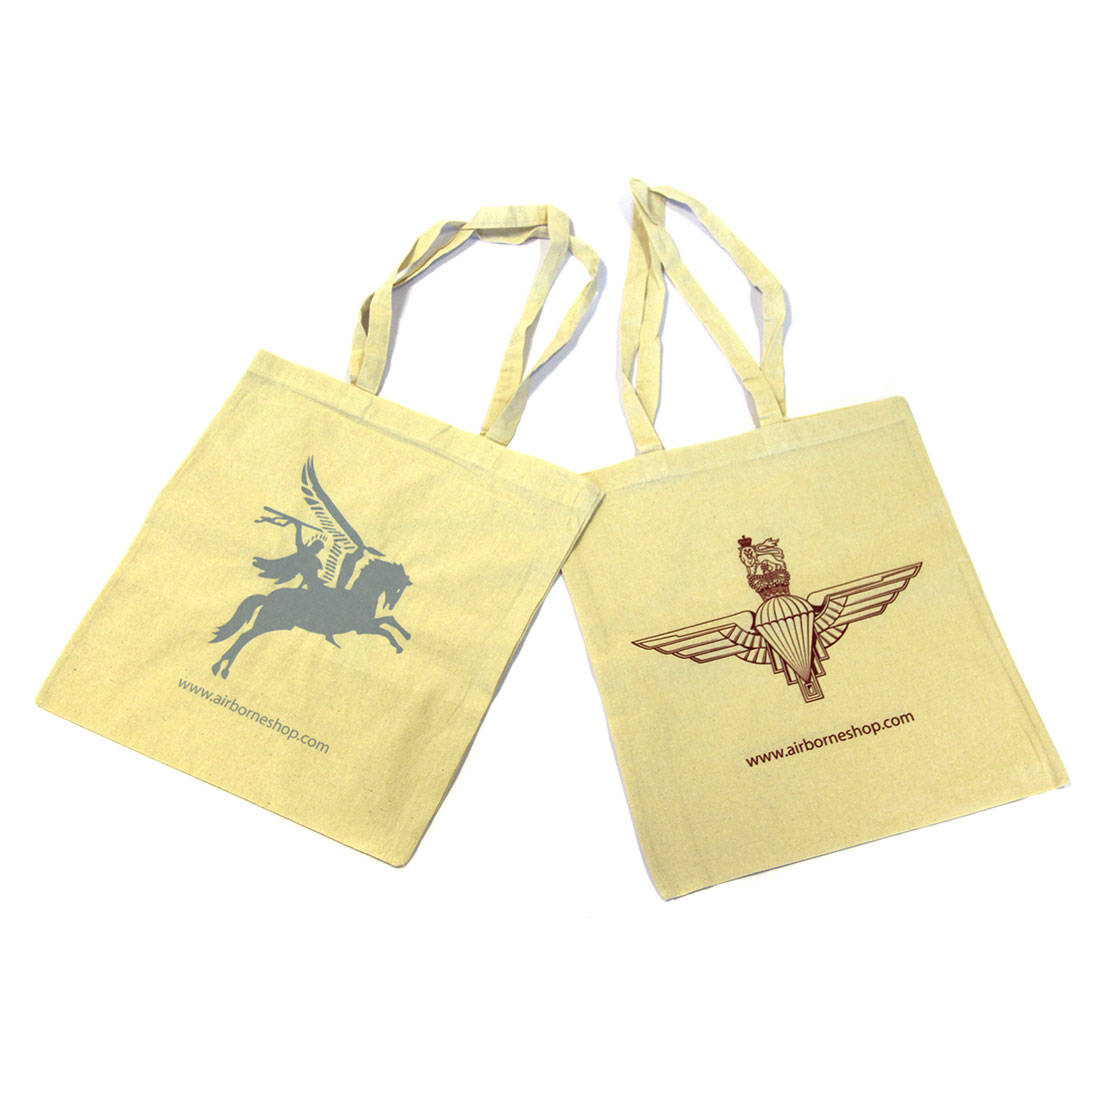 Cotton Shopping Bag with Para or Pegasus